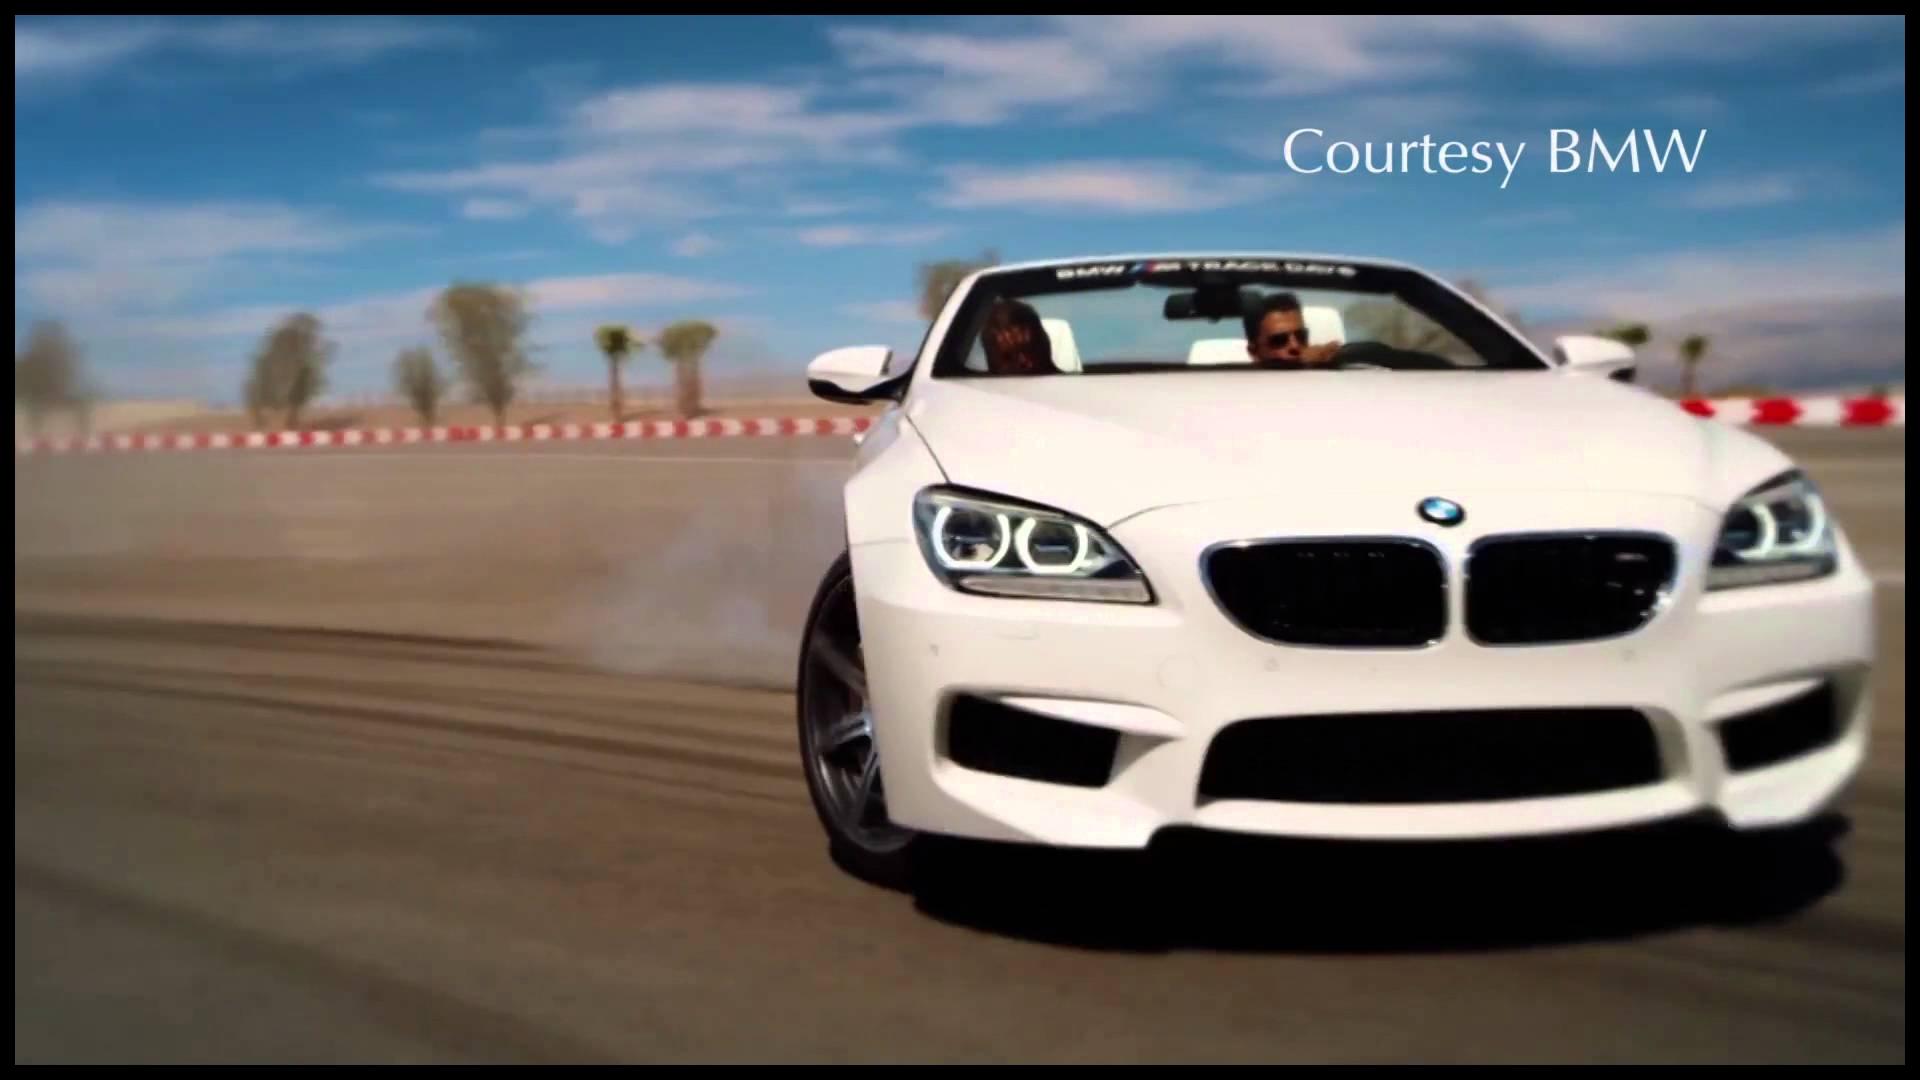 Racing BMW s in the Desert